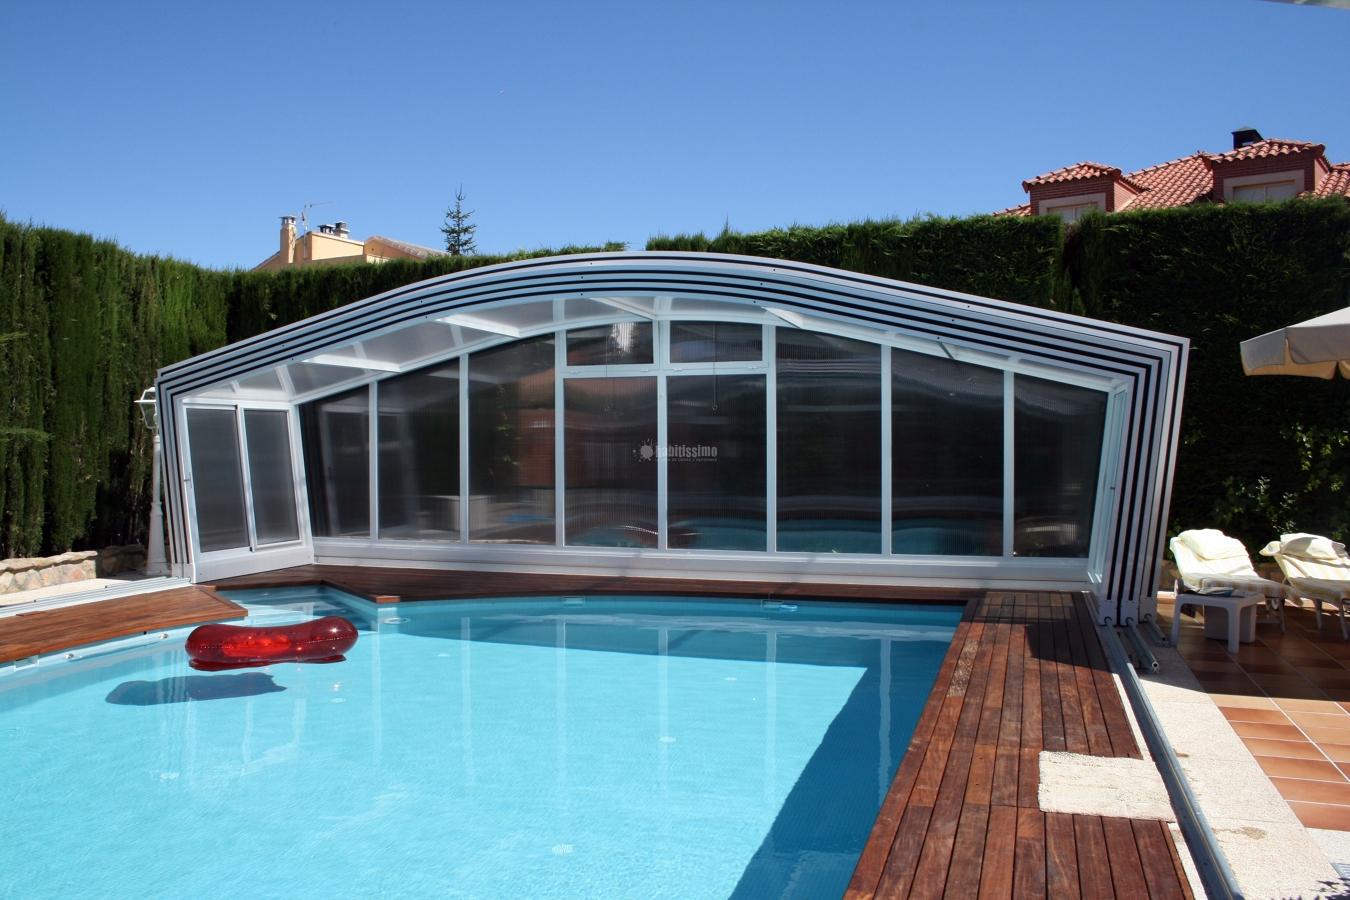 Foto carpinter a aluminio techos m viles cubiertas for Piscinas de aluminio